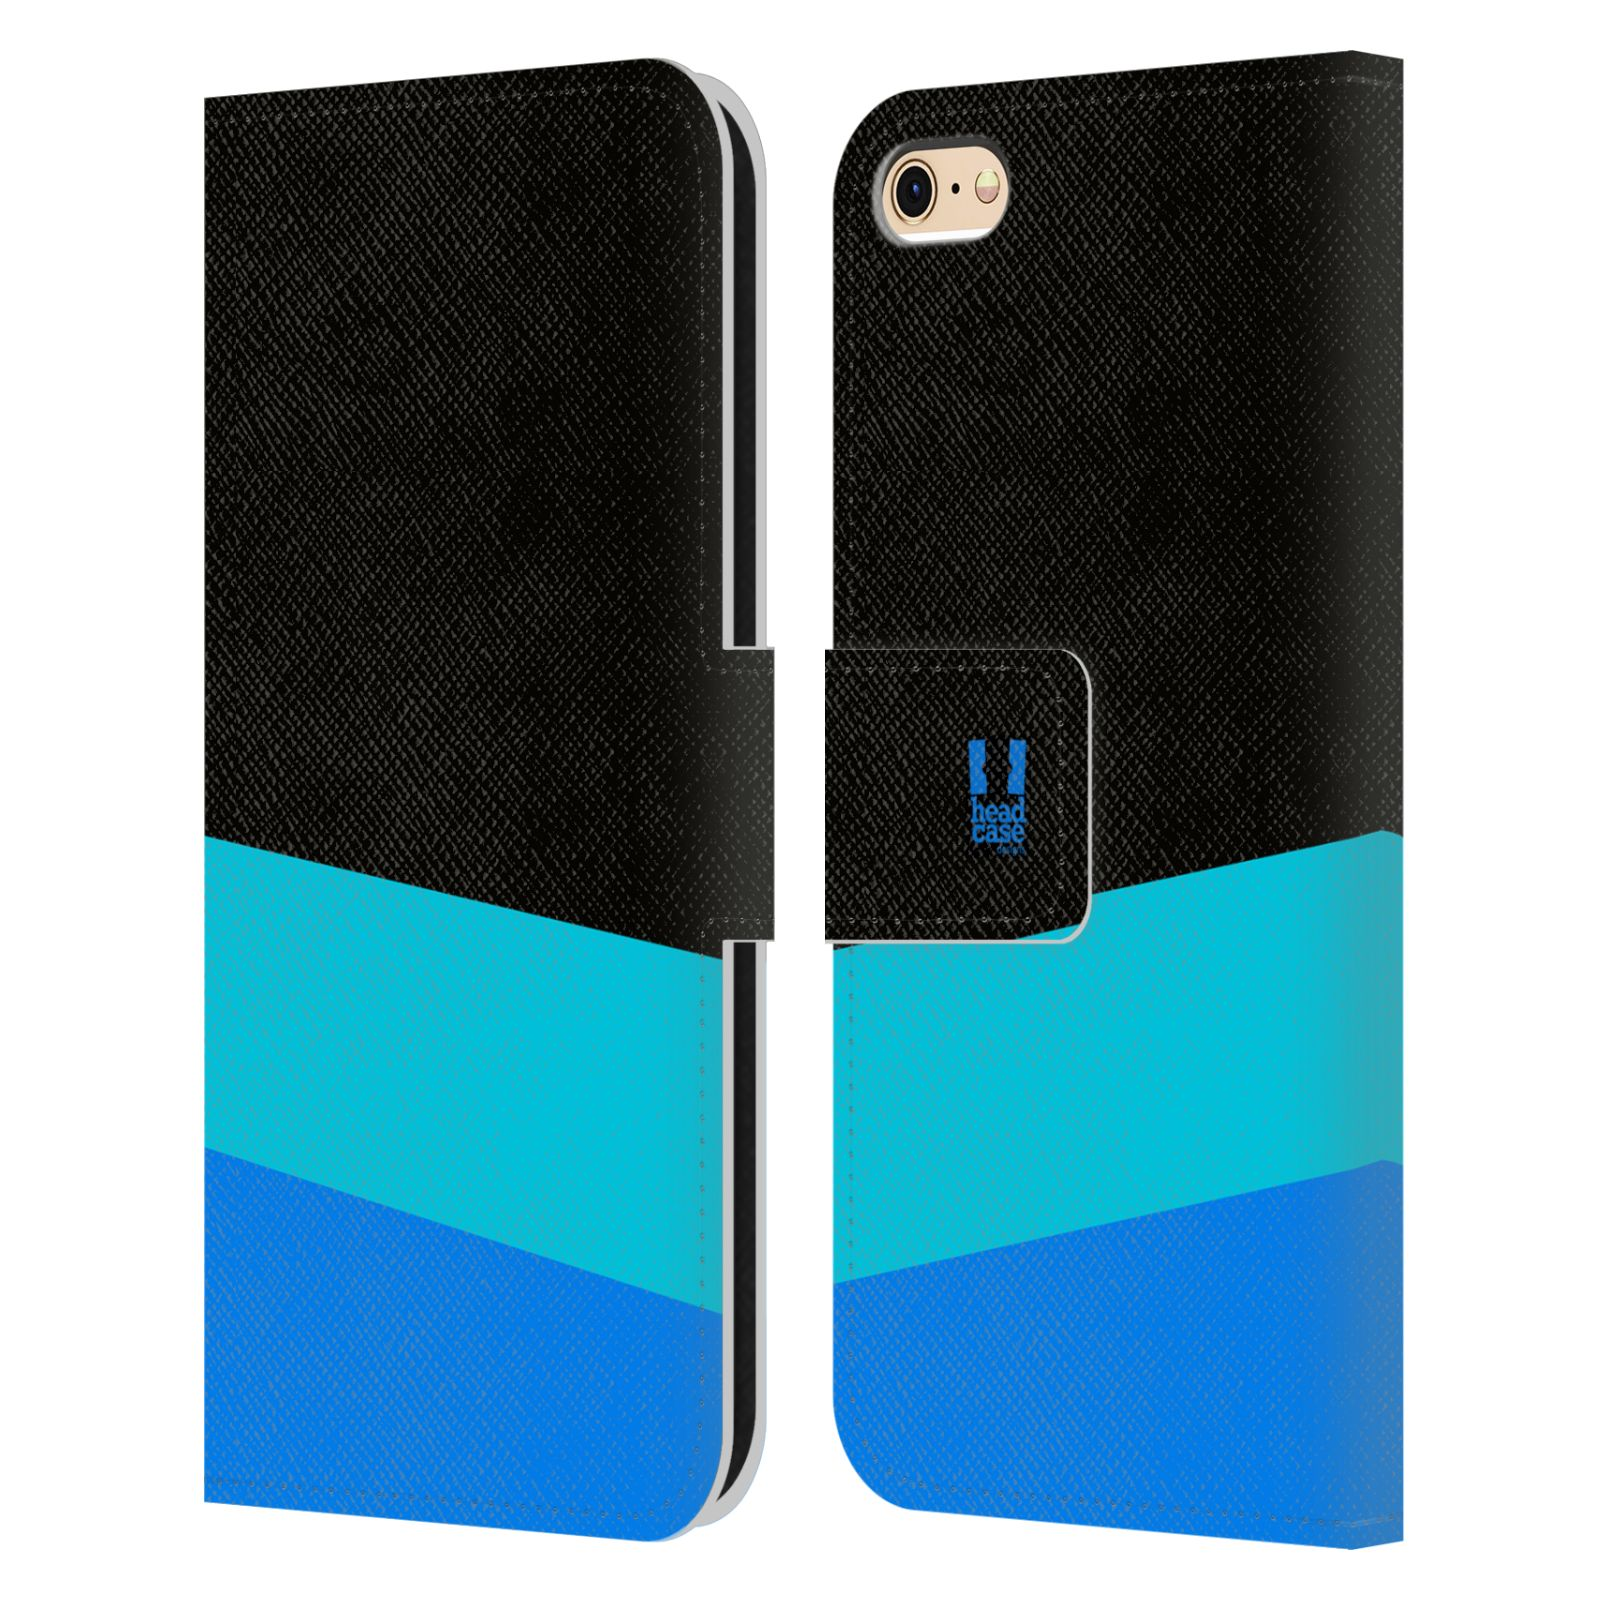 HEAD CASE Flipové pouzdro pro mobil Apple Iphone 6/6s barevné tvary modrá a černá FORMAL